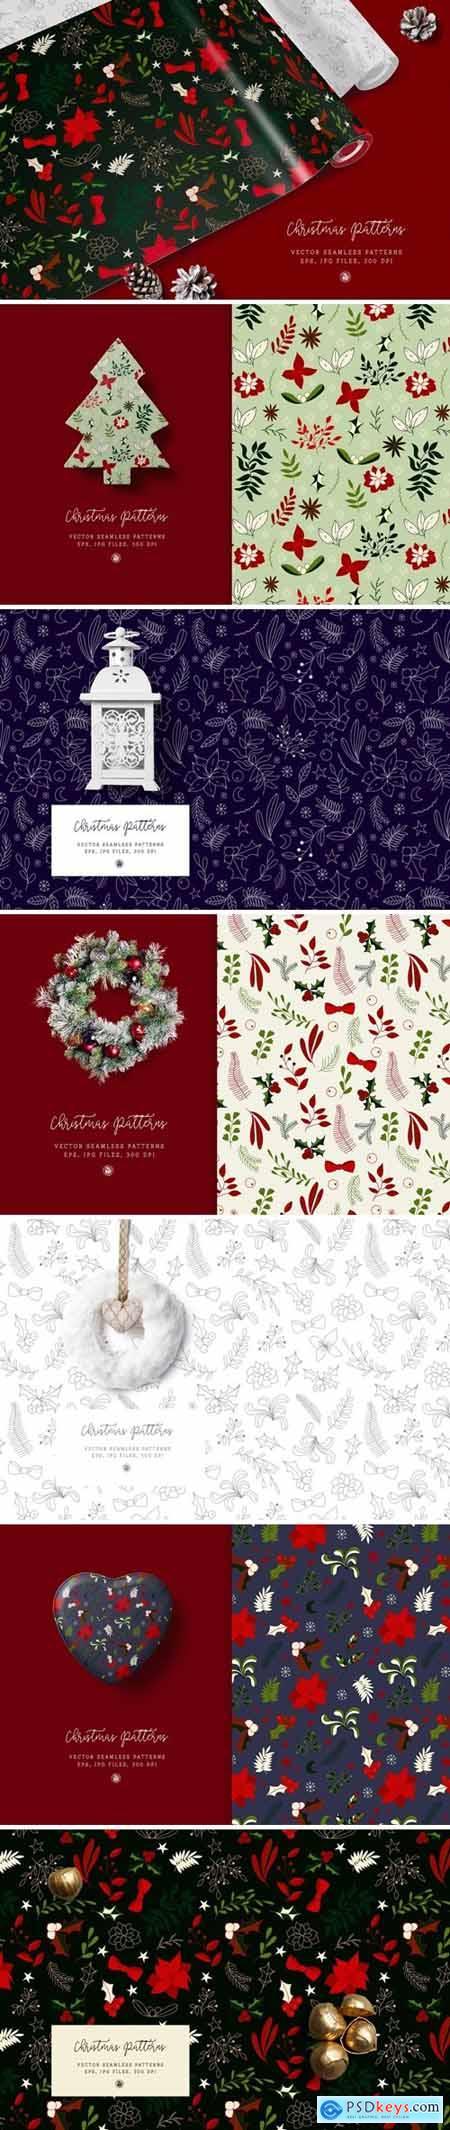 Christmas Patterns vol2